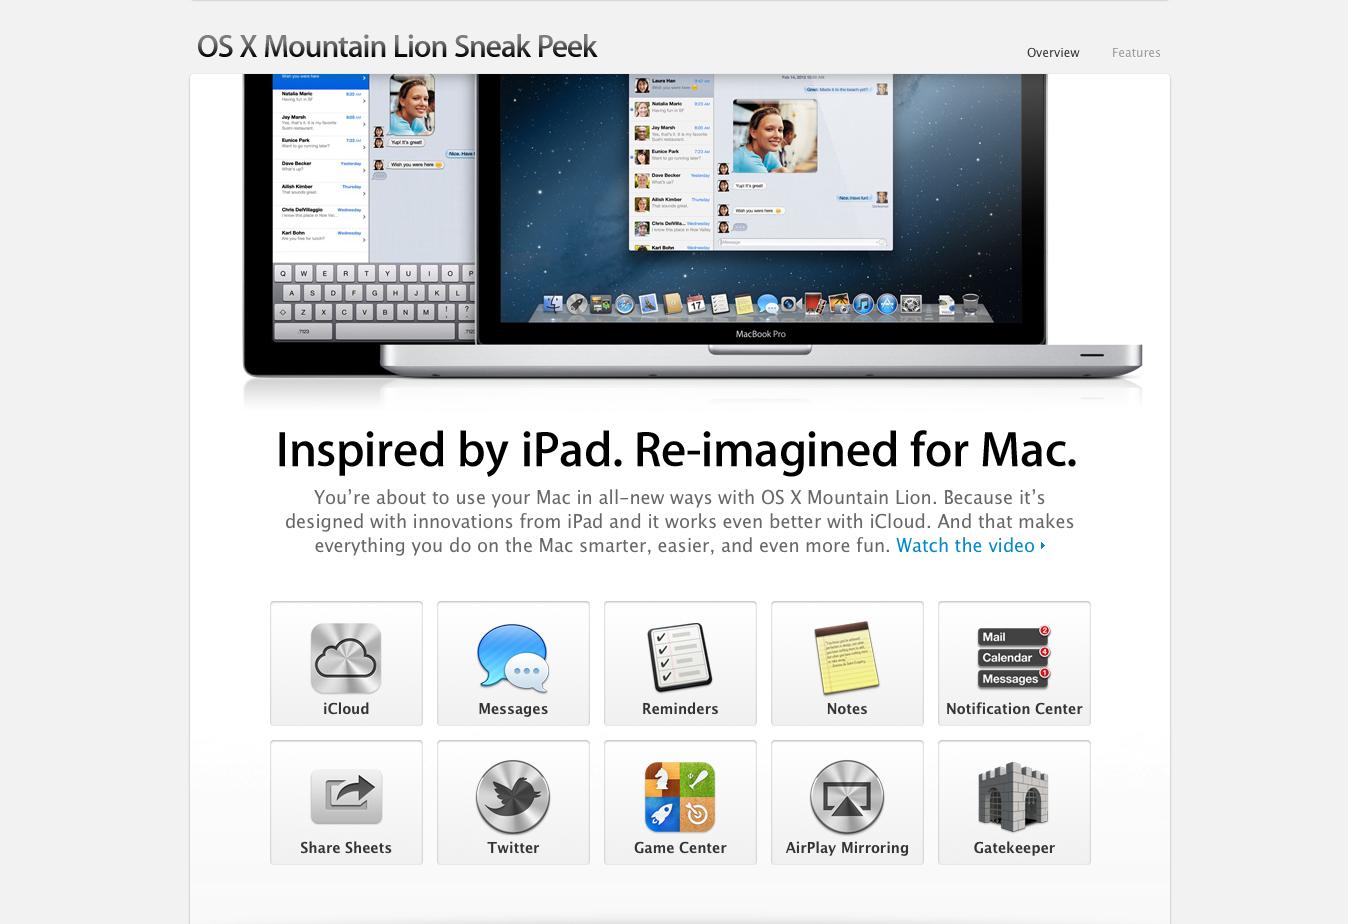 AppAdvice Daily: OS X Mountain Lion Announced - Video Walkthrough